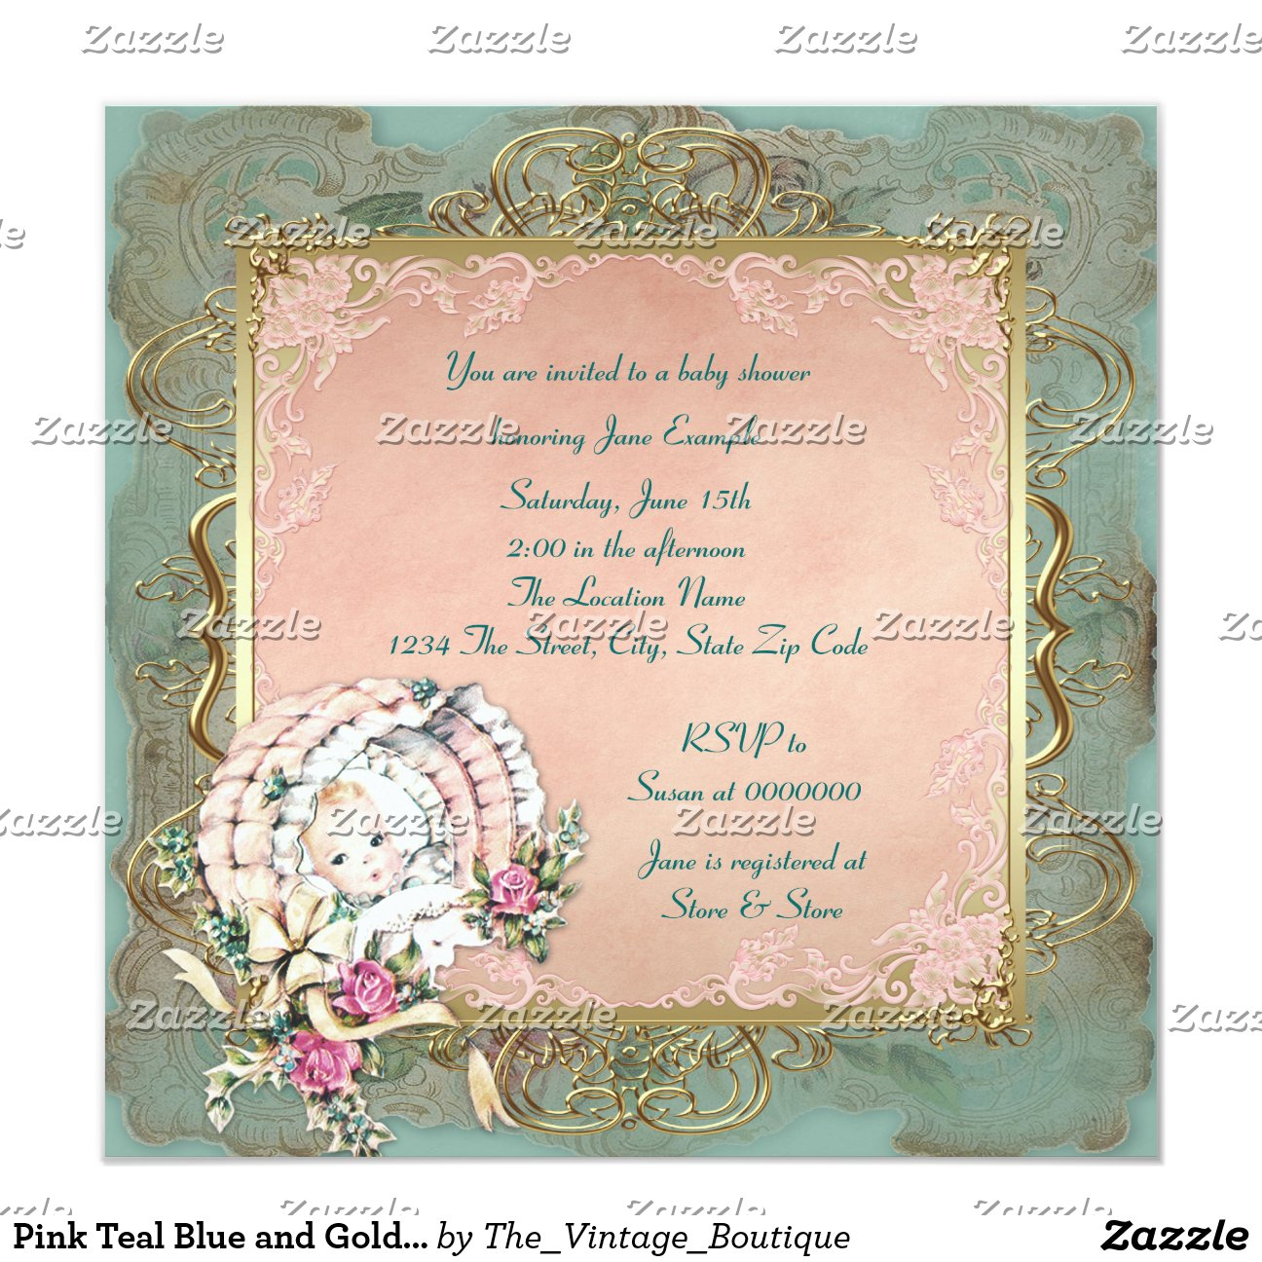 pink_teal_blue_and_gold_vintage_girl_baby_shower ...